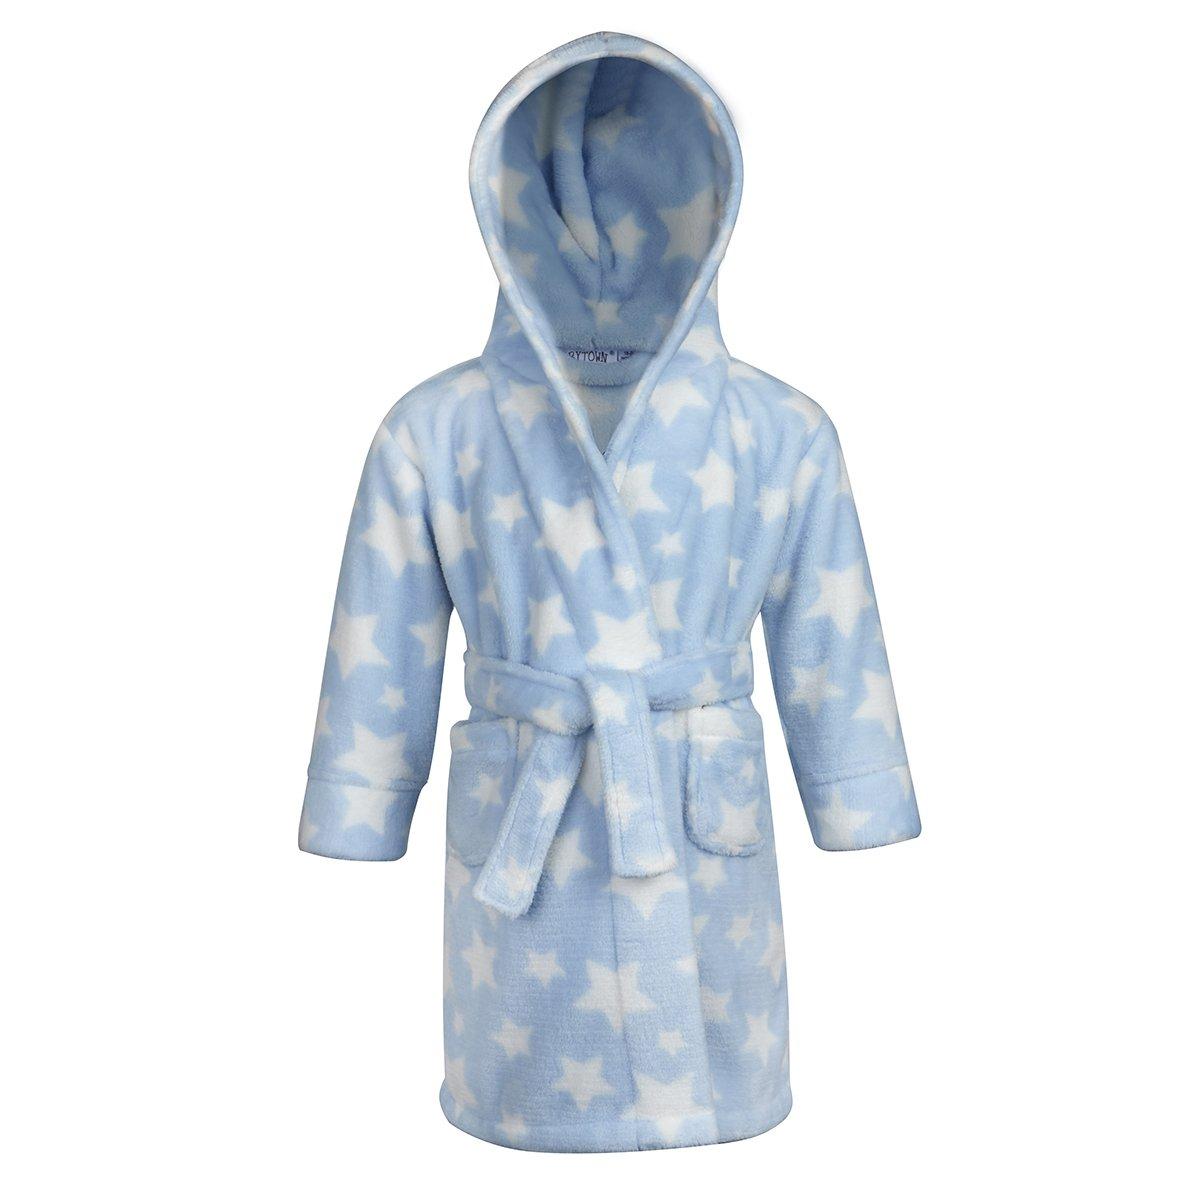 BABY TOWN Babytown Baby Boys and Girls Unisex Snuggle Fleece Hooded Lamb Dressing Robe